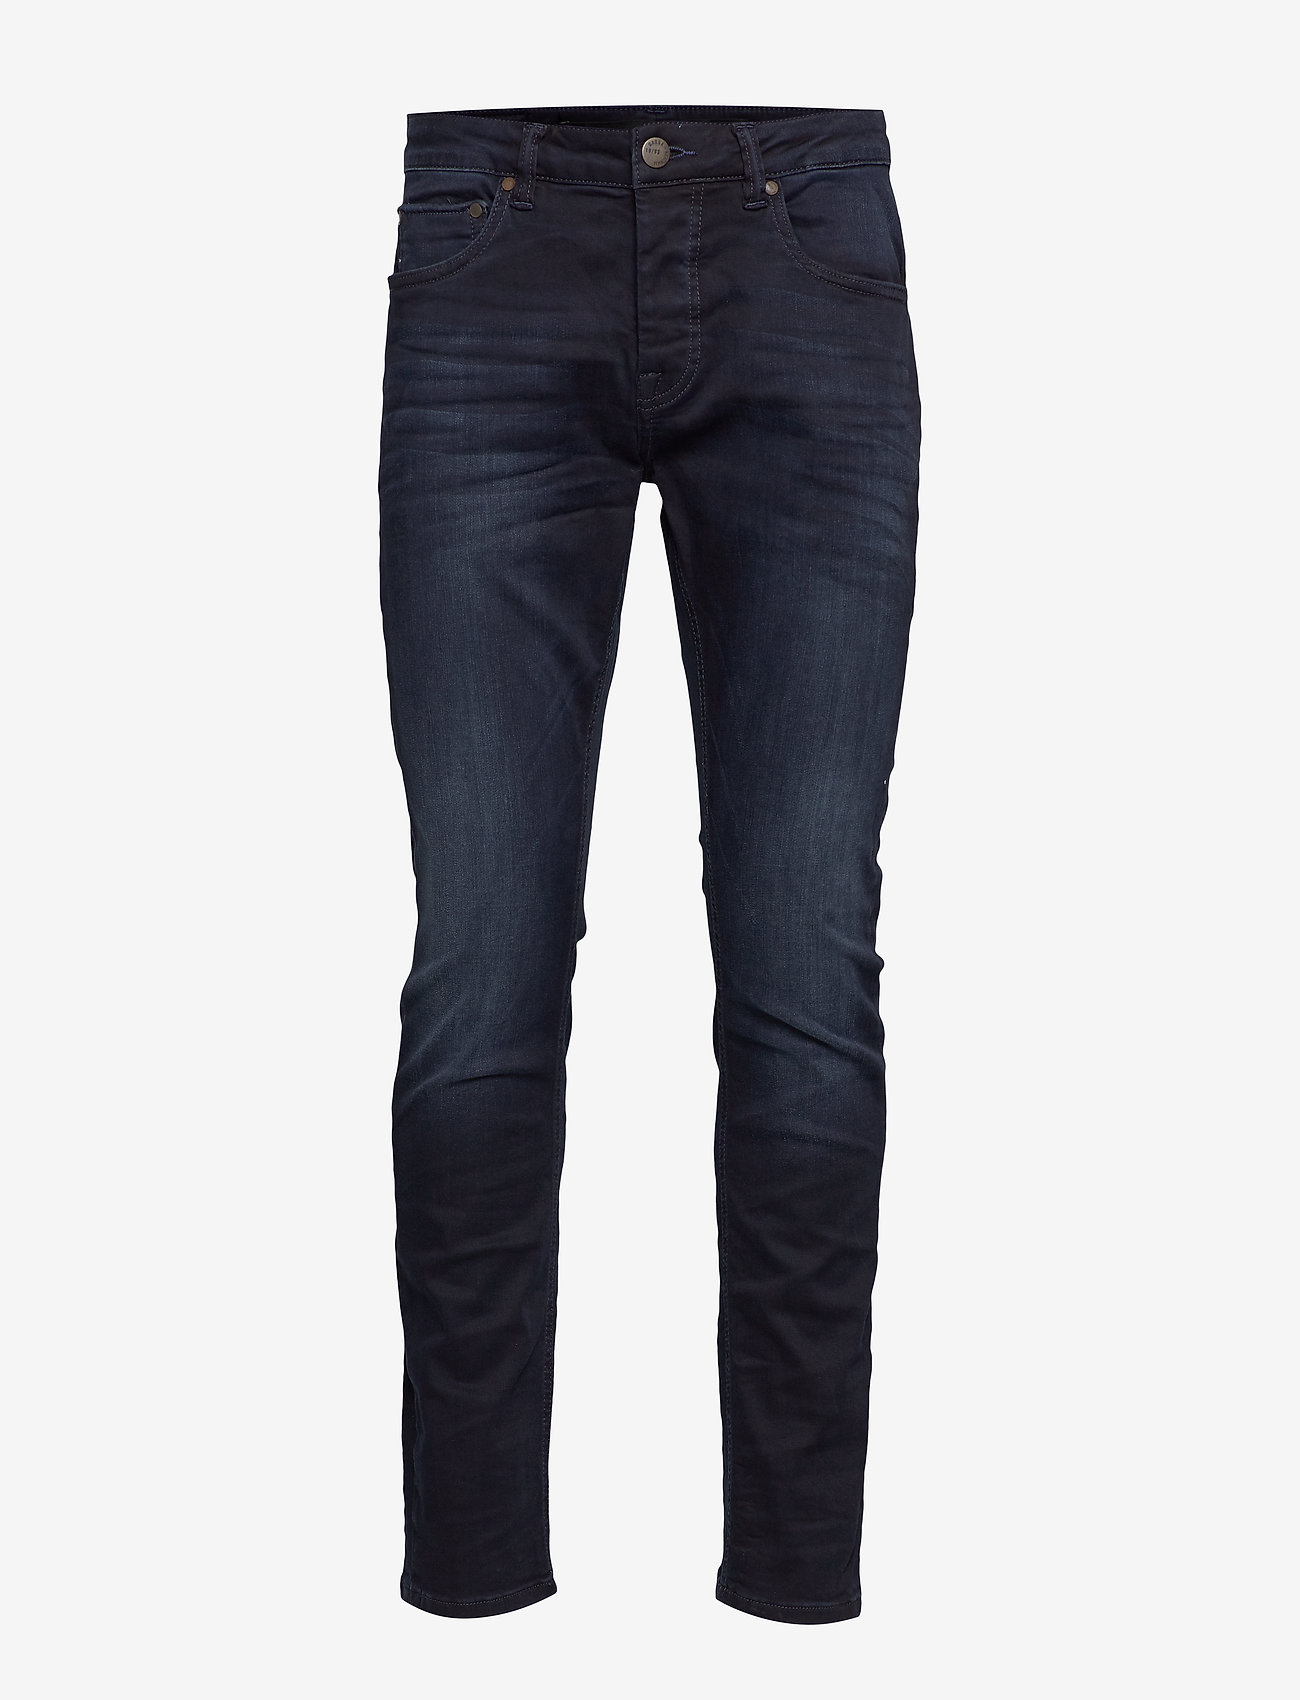 Gabba - Jones K2291 - slim jeans - rs1104 - 0